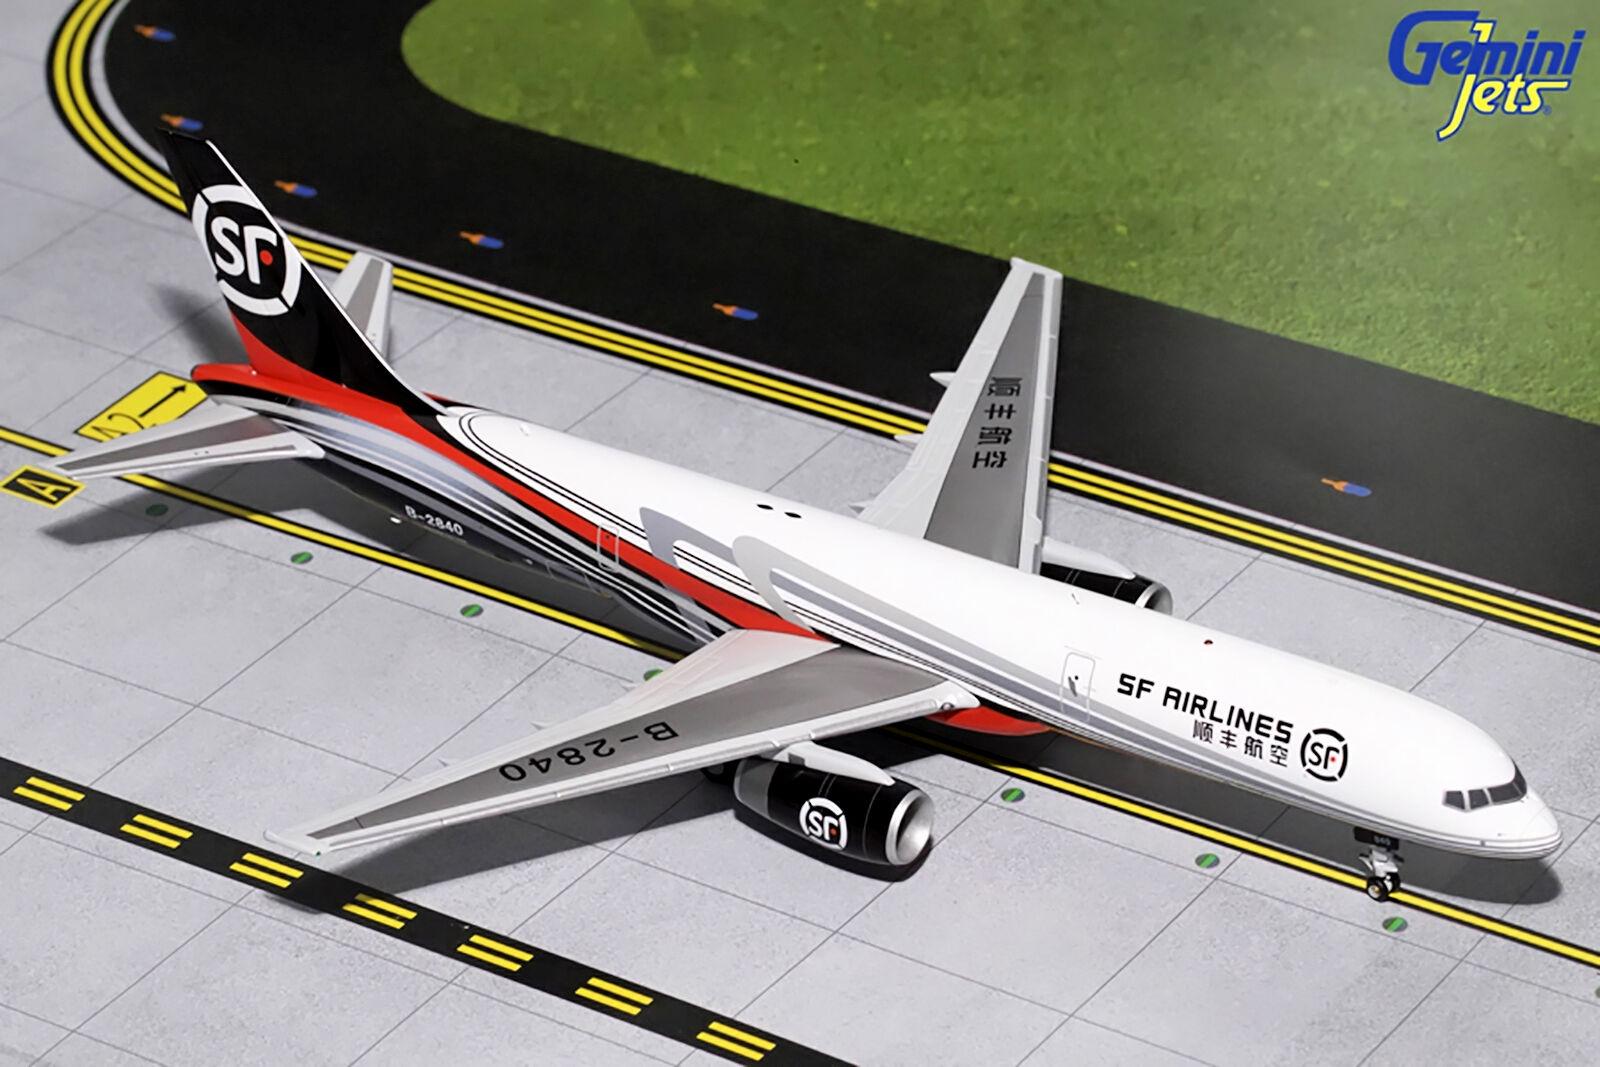 Gemini200 sf airlines boeing boeing boeing 757-200f g2css657 1   200, reg   b-2840.neue 637568